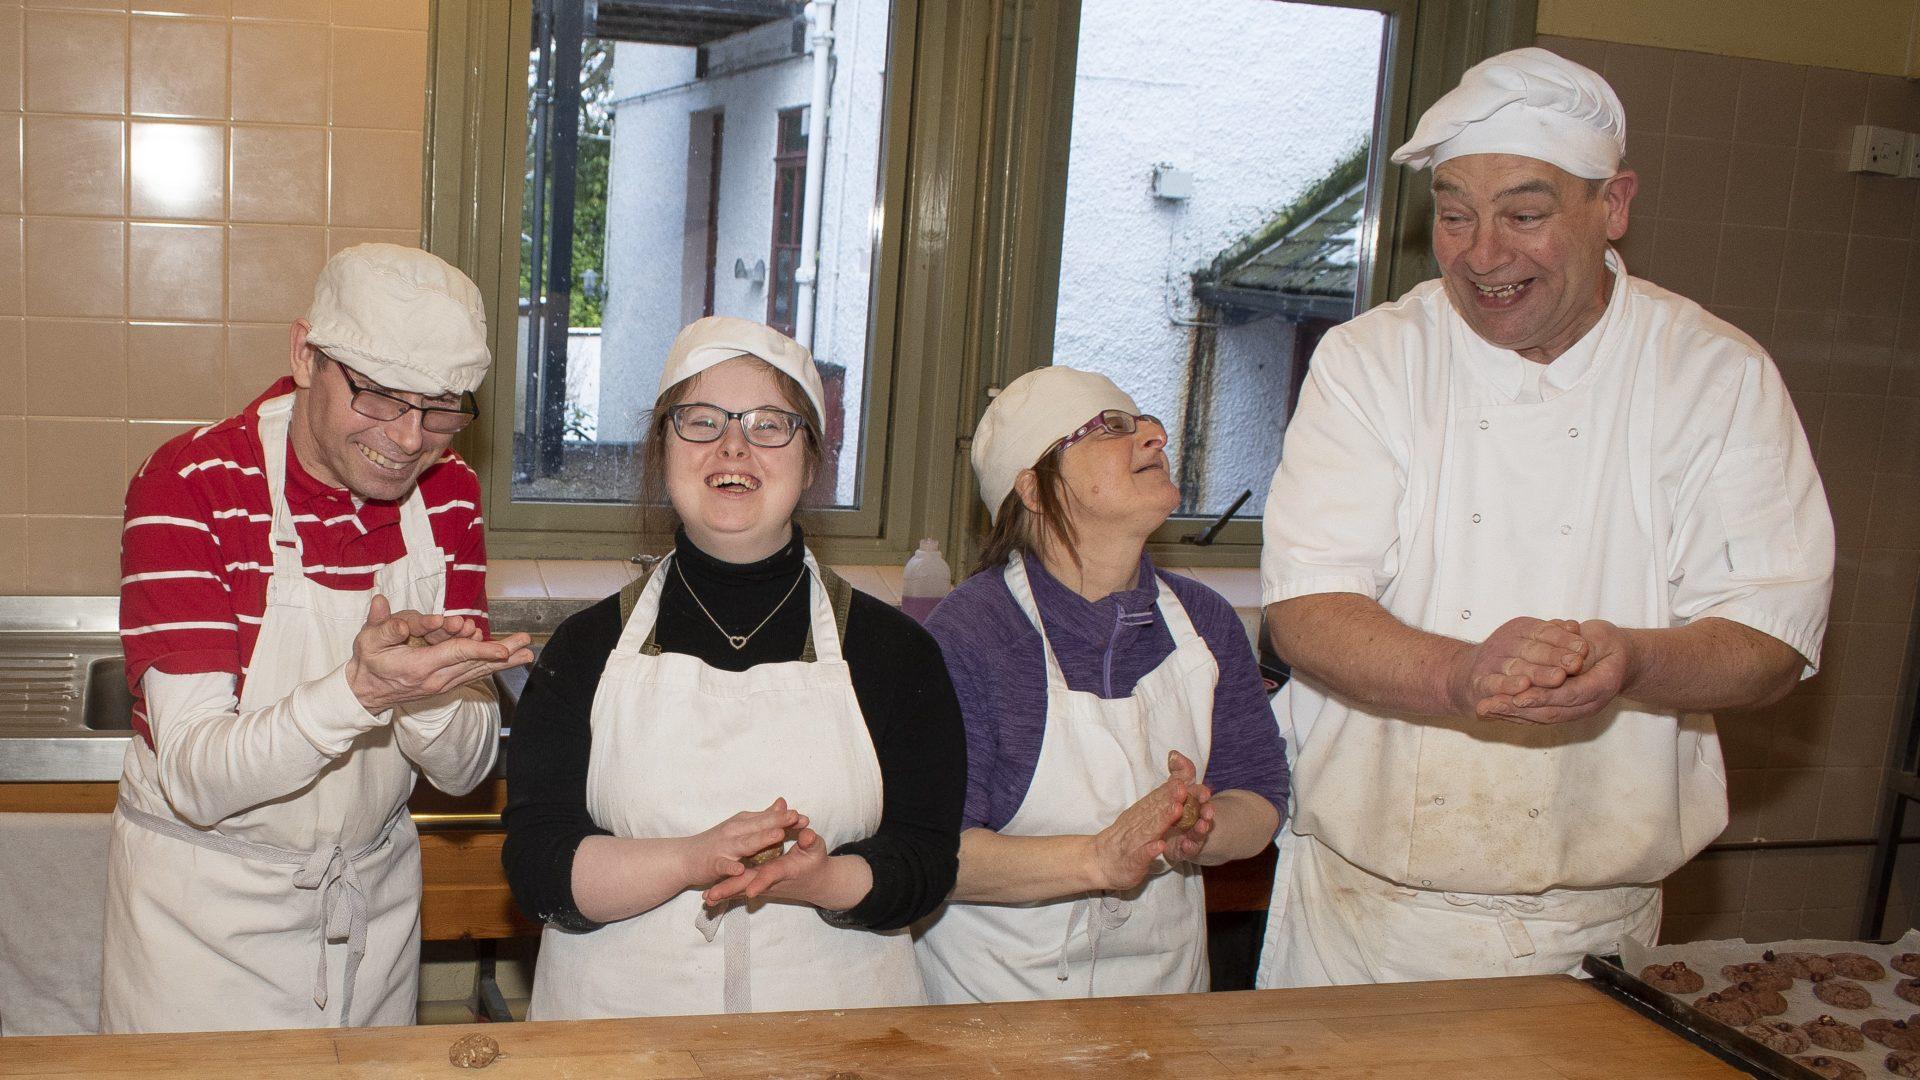 camphill residents baking